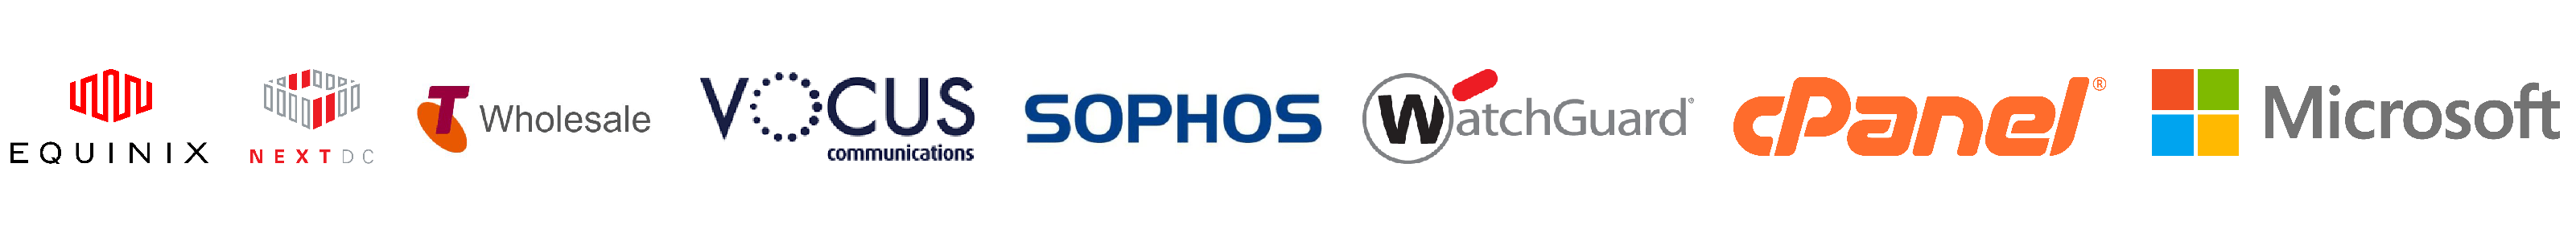 equinix nextdc telstra vocus sophos watchguard cPanel Microsoft web hosting